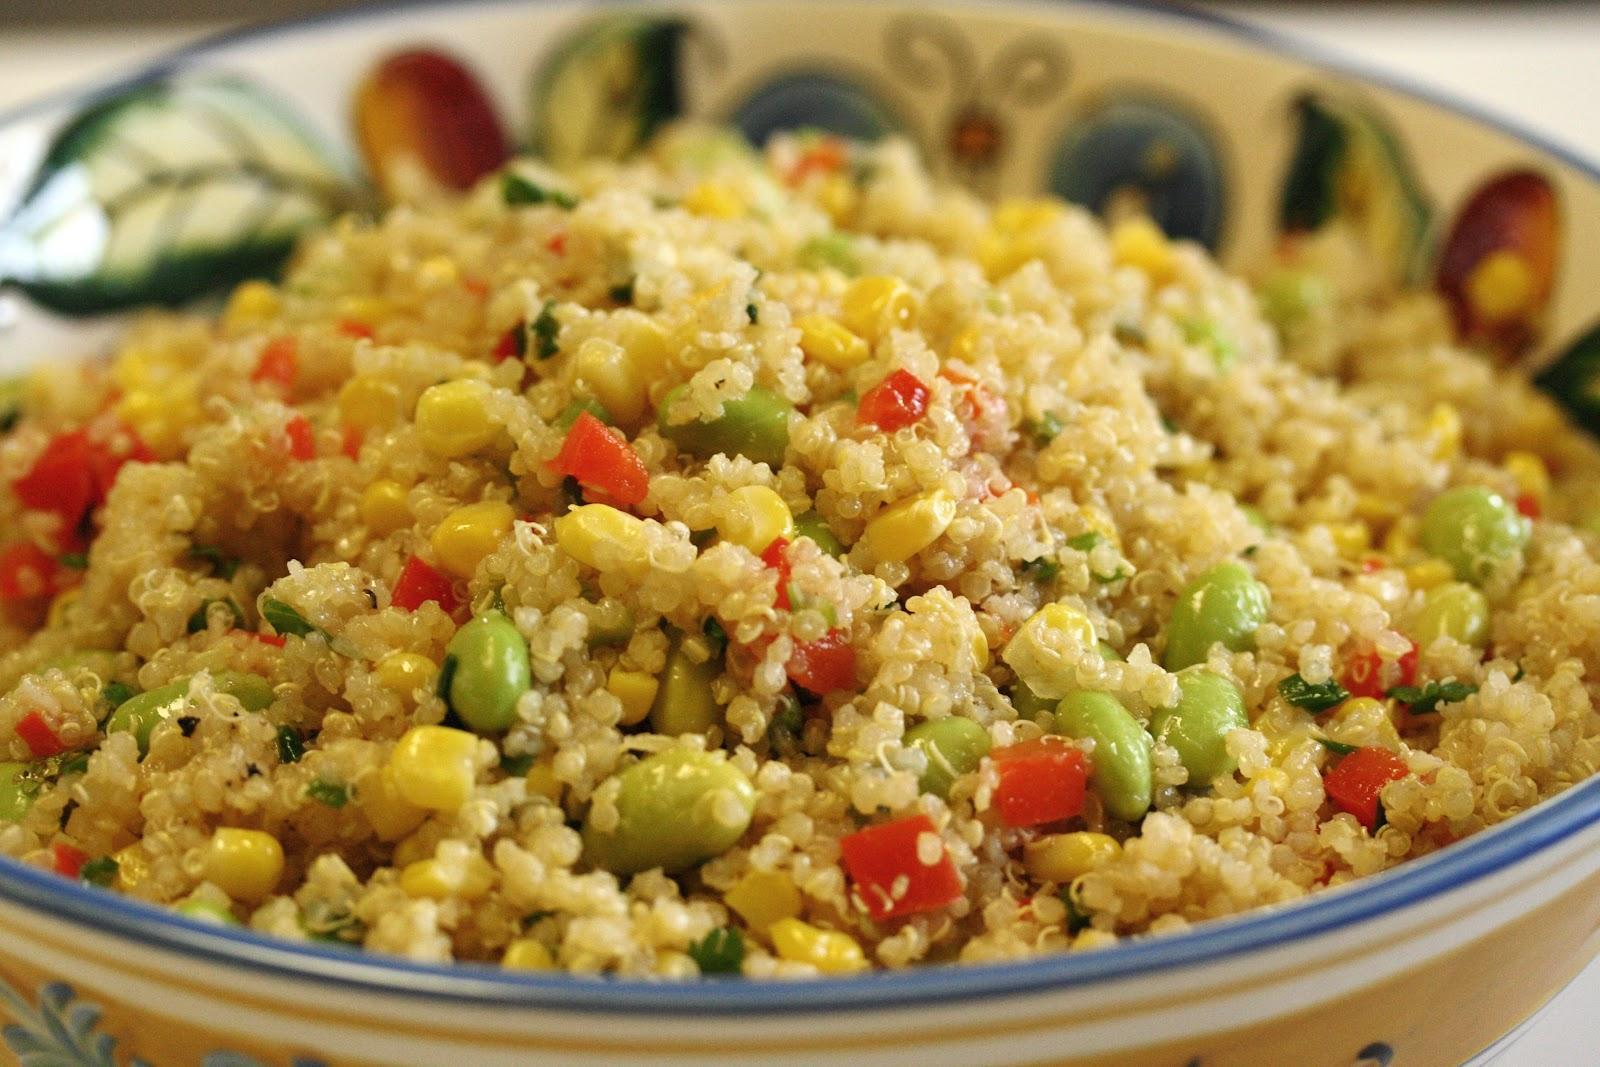 Quinoa Edamame and Corn Salad - Saving Room for Dessert